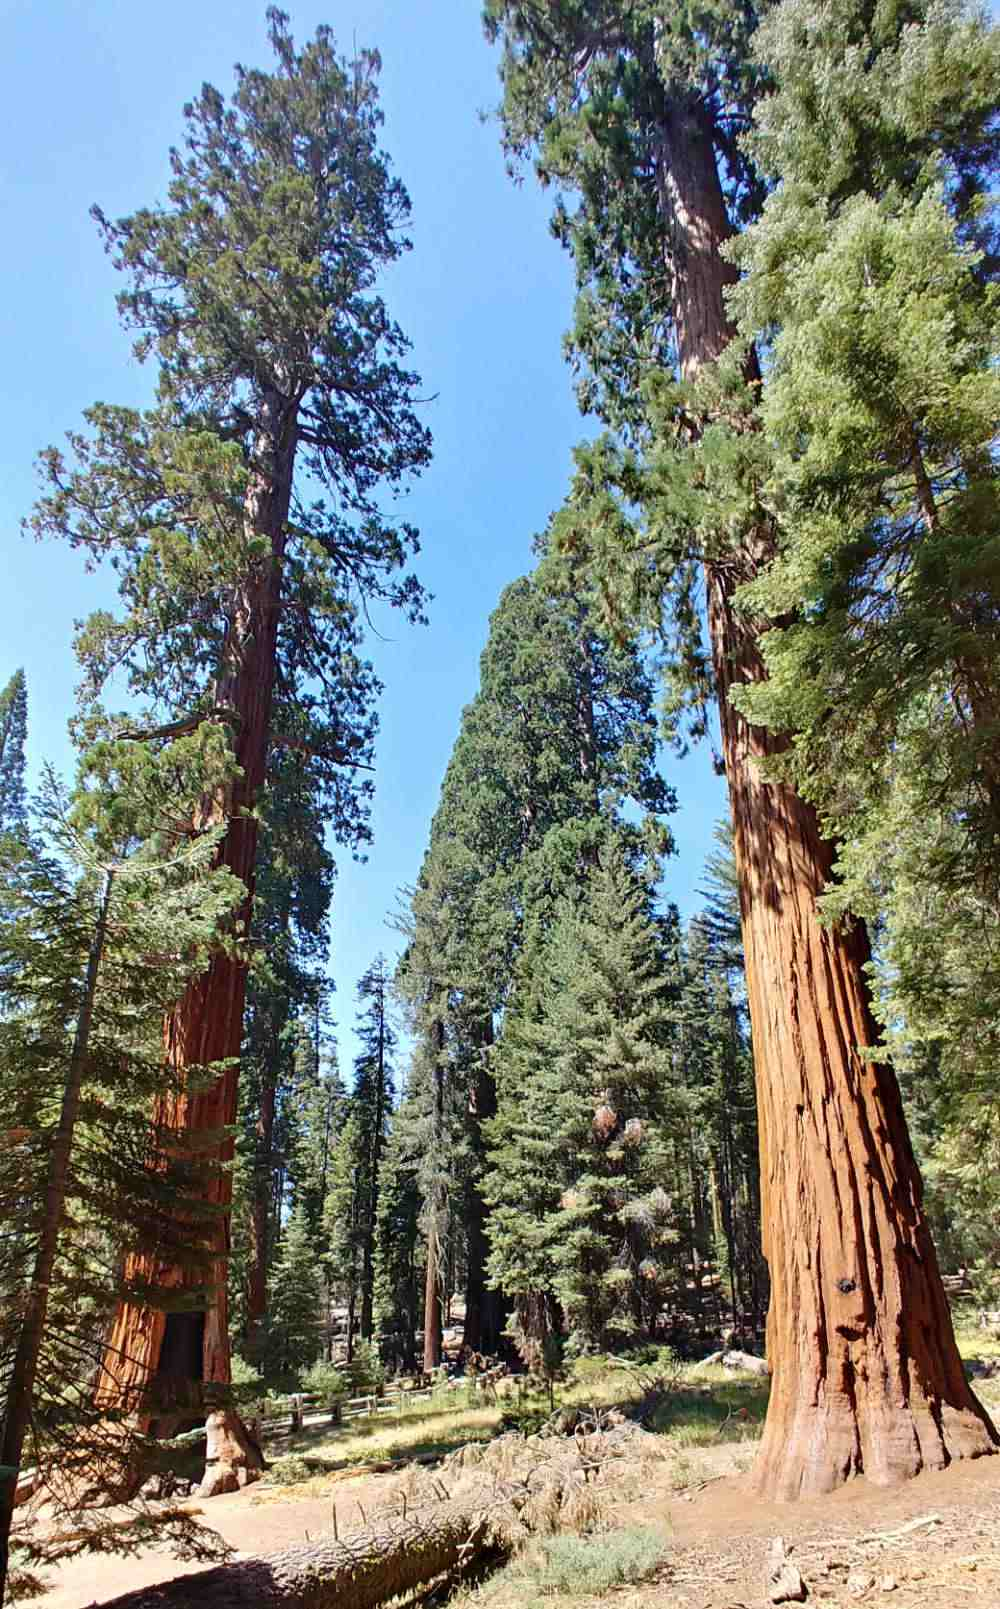 Height of sequoia trees.